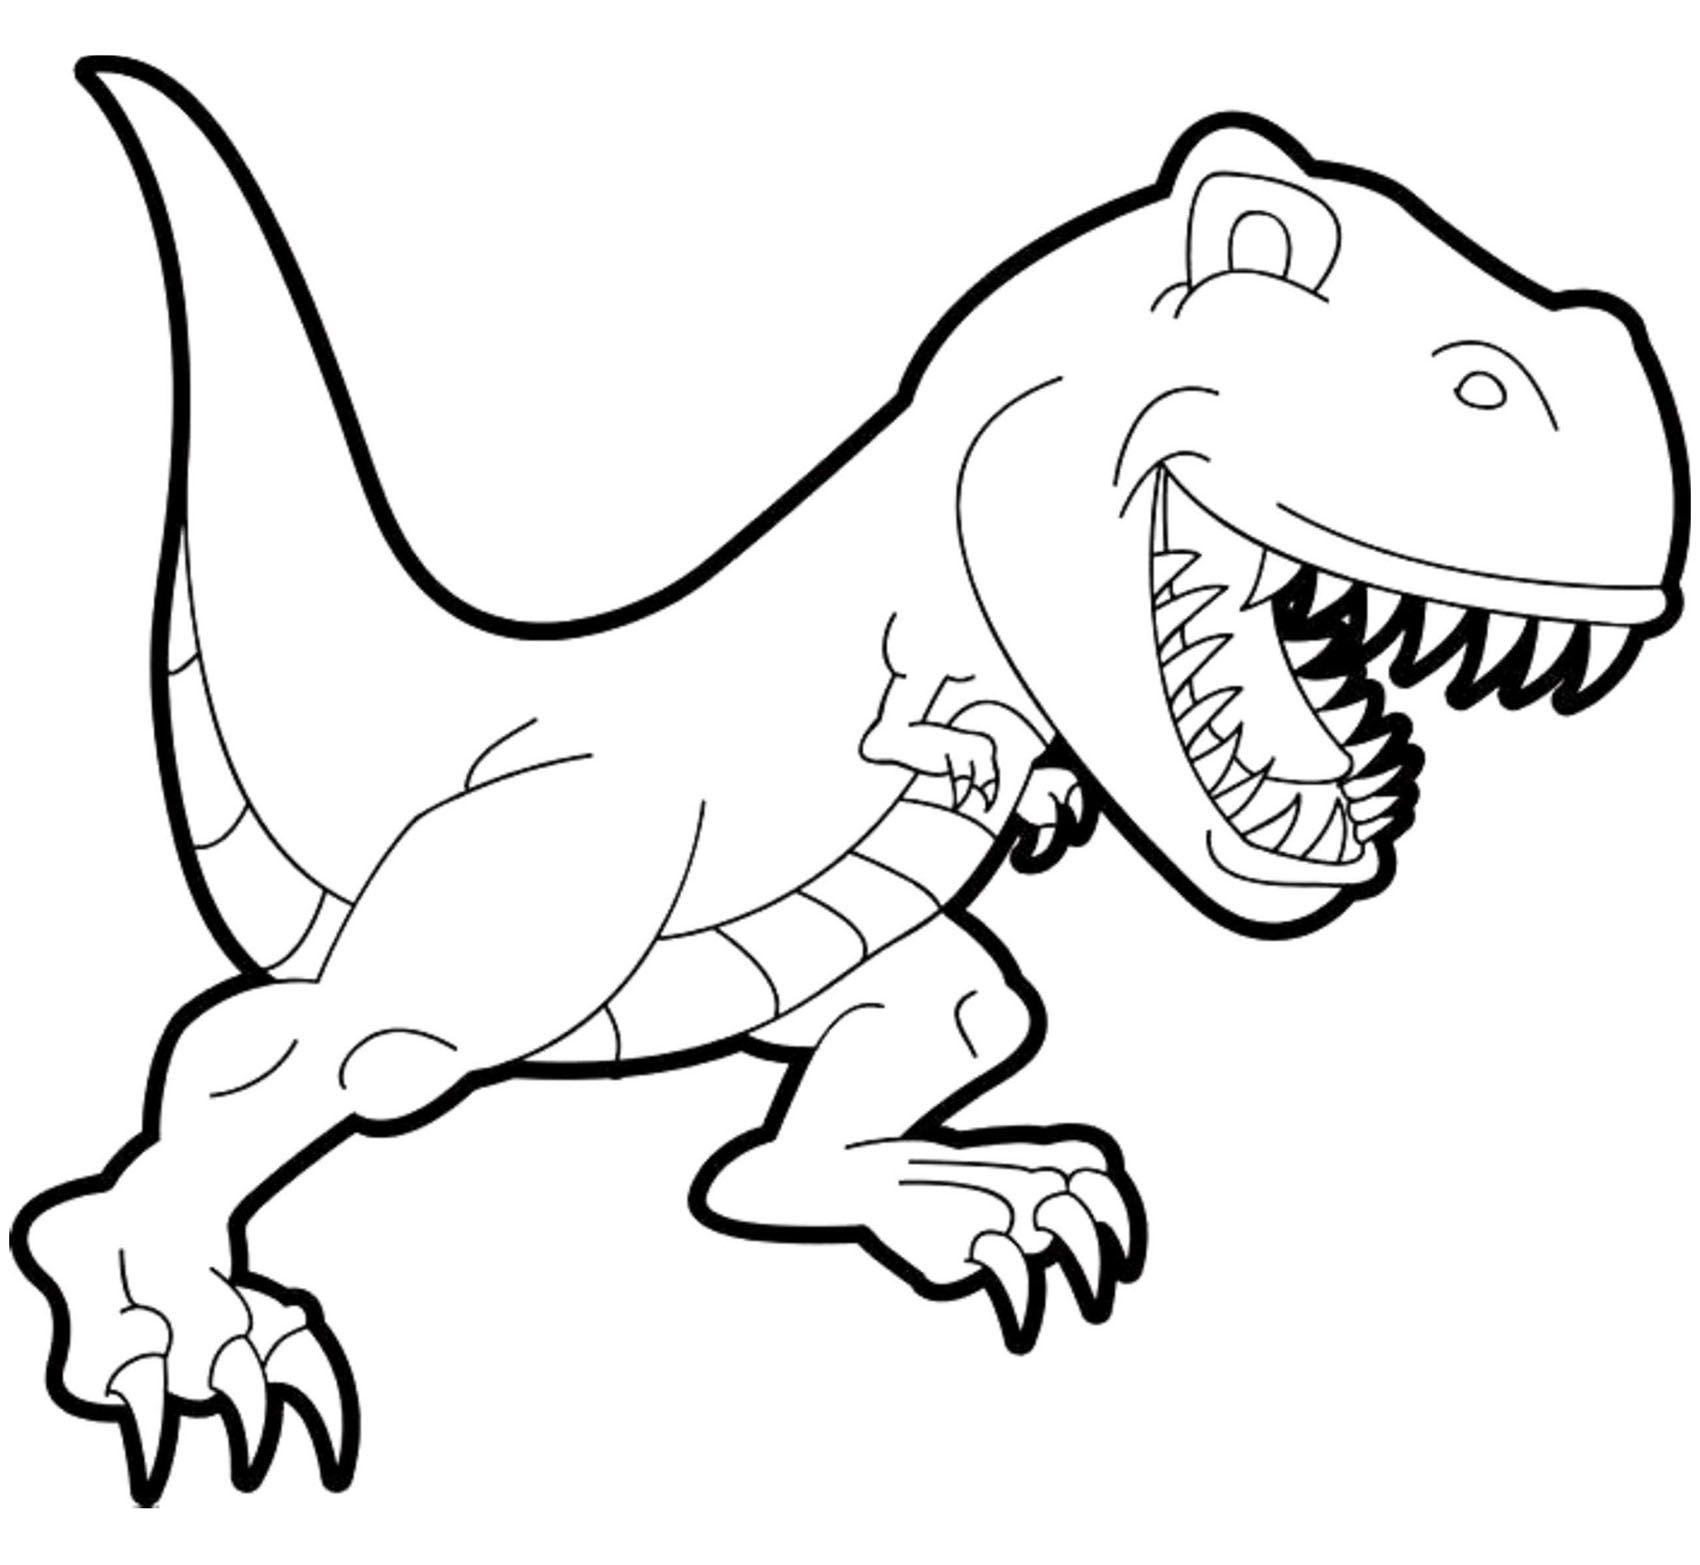 Coloring Pages Of Animals Dinosaurs Dengan Gambar Halaman Mewarnai